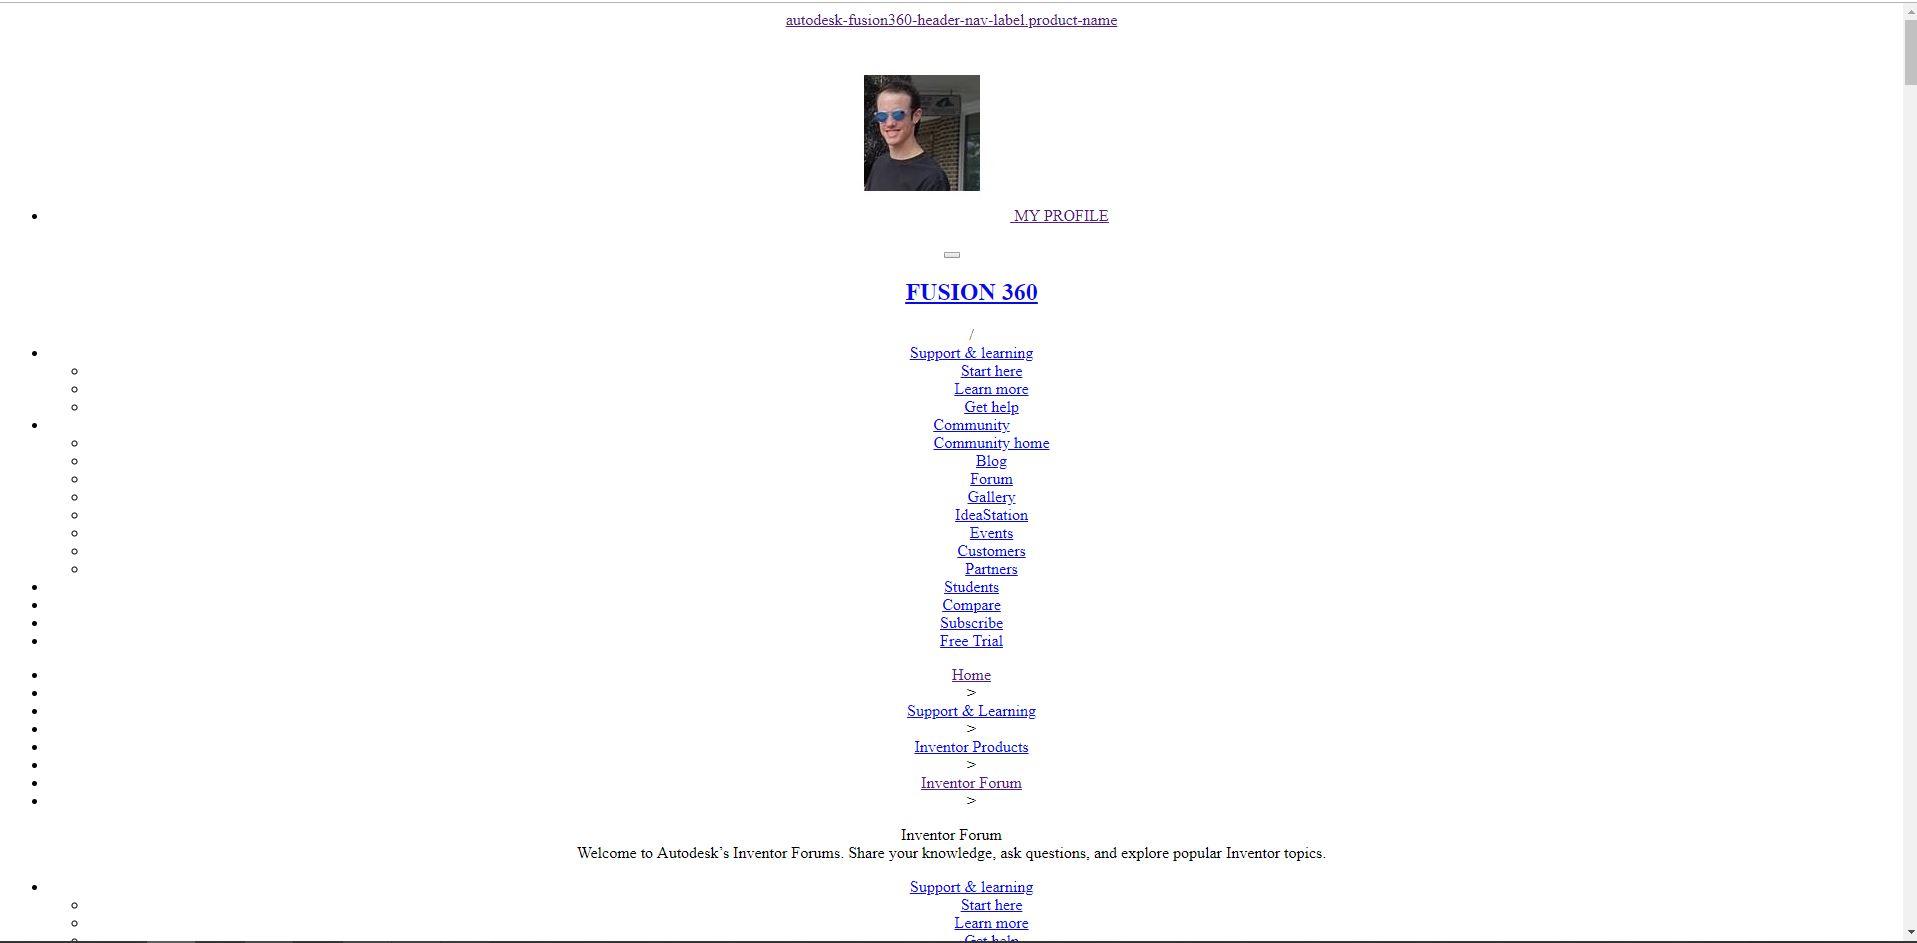 Autodesk Forum Website and Browser Display - Autodesk